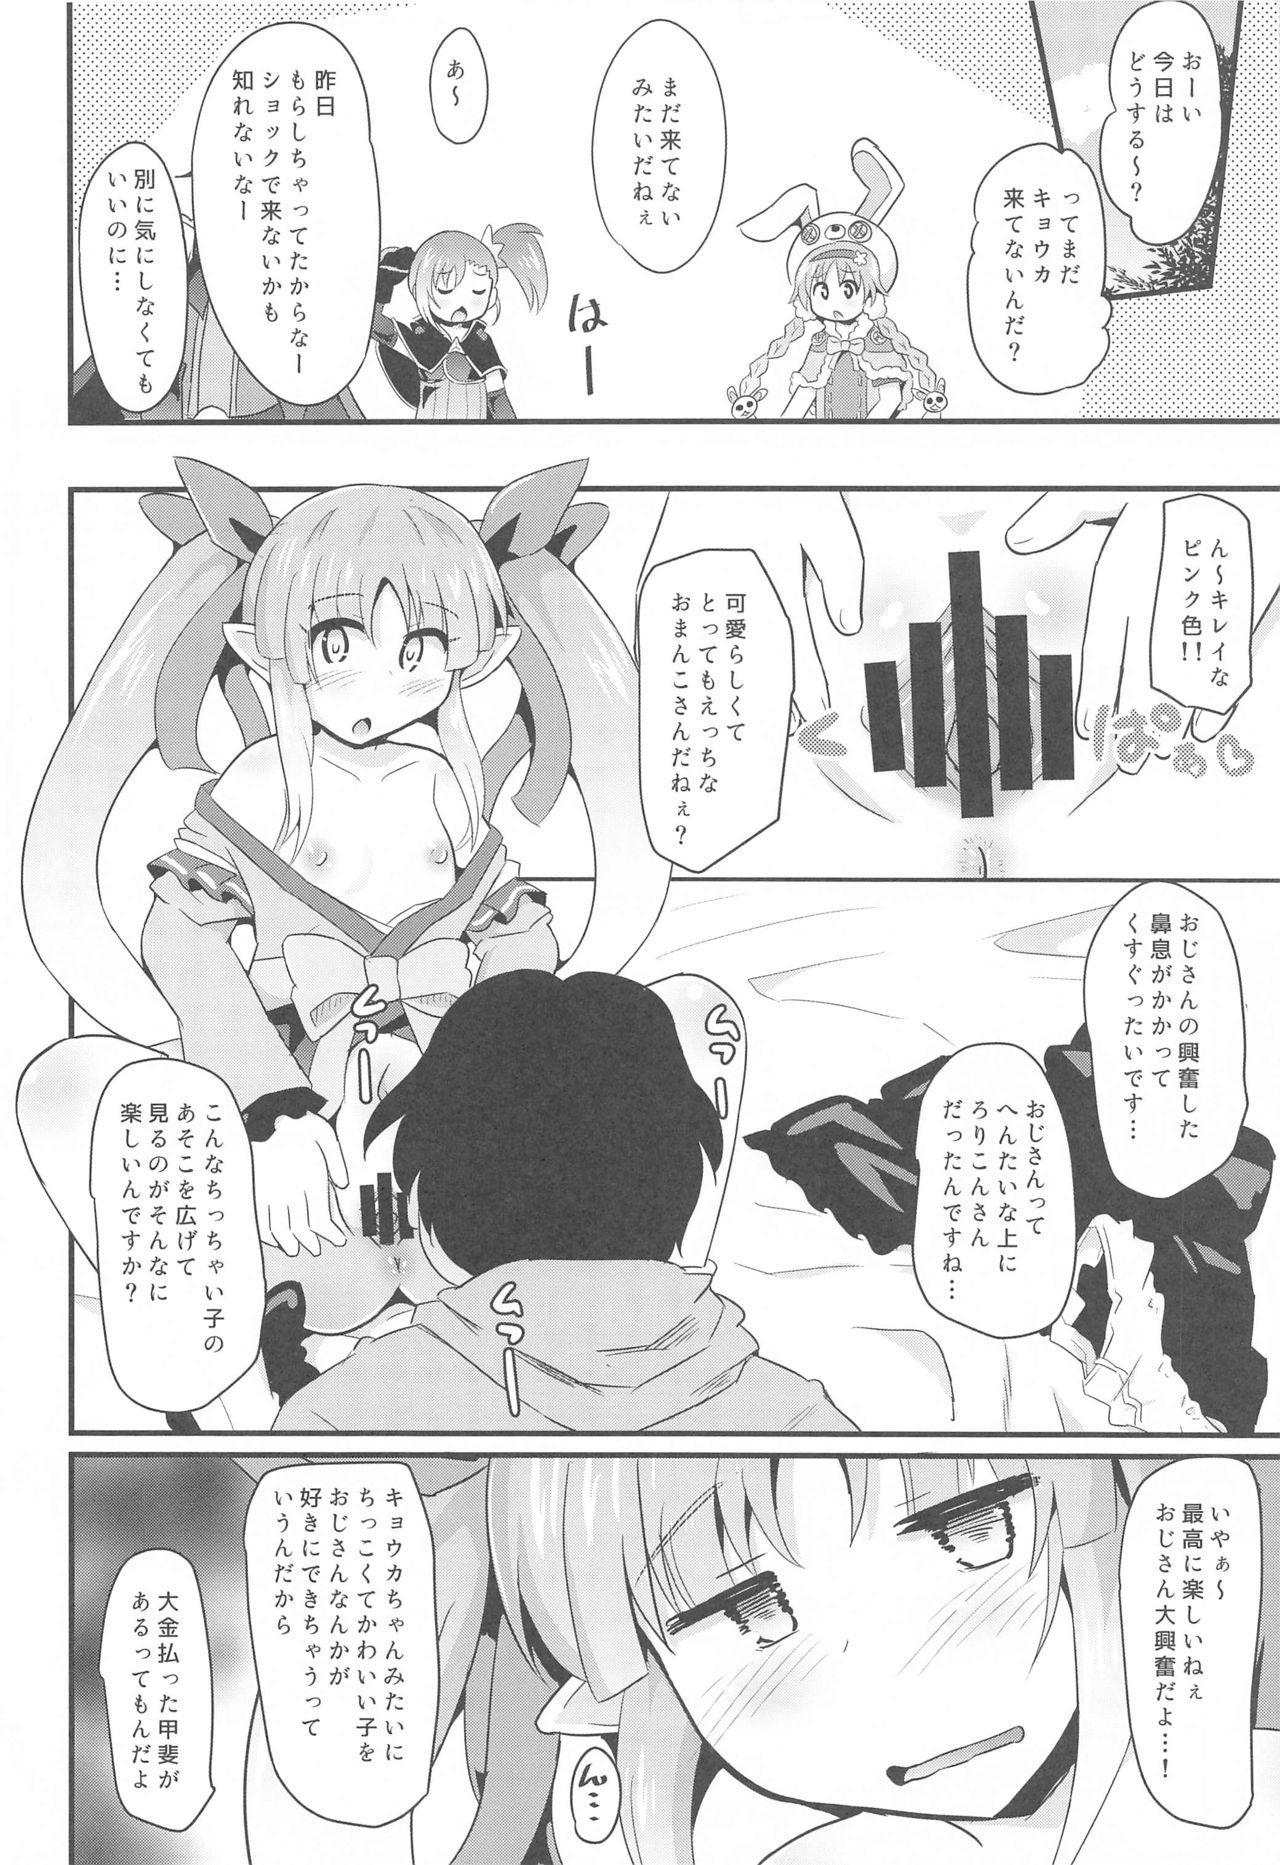 Kyouka-chan to Saimin Hentai Ecchi!! 8